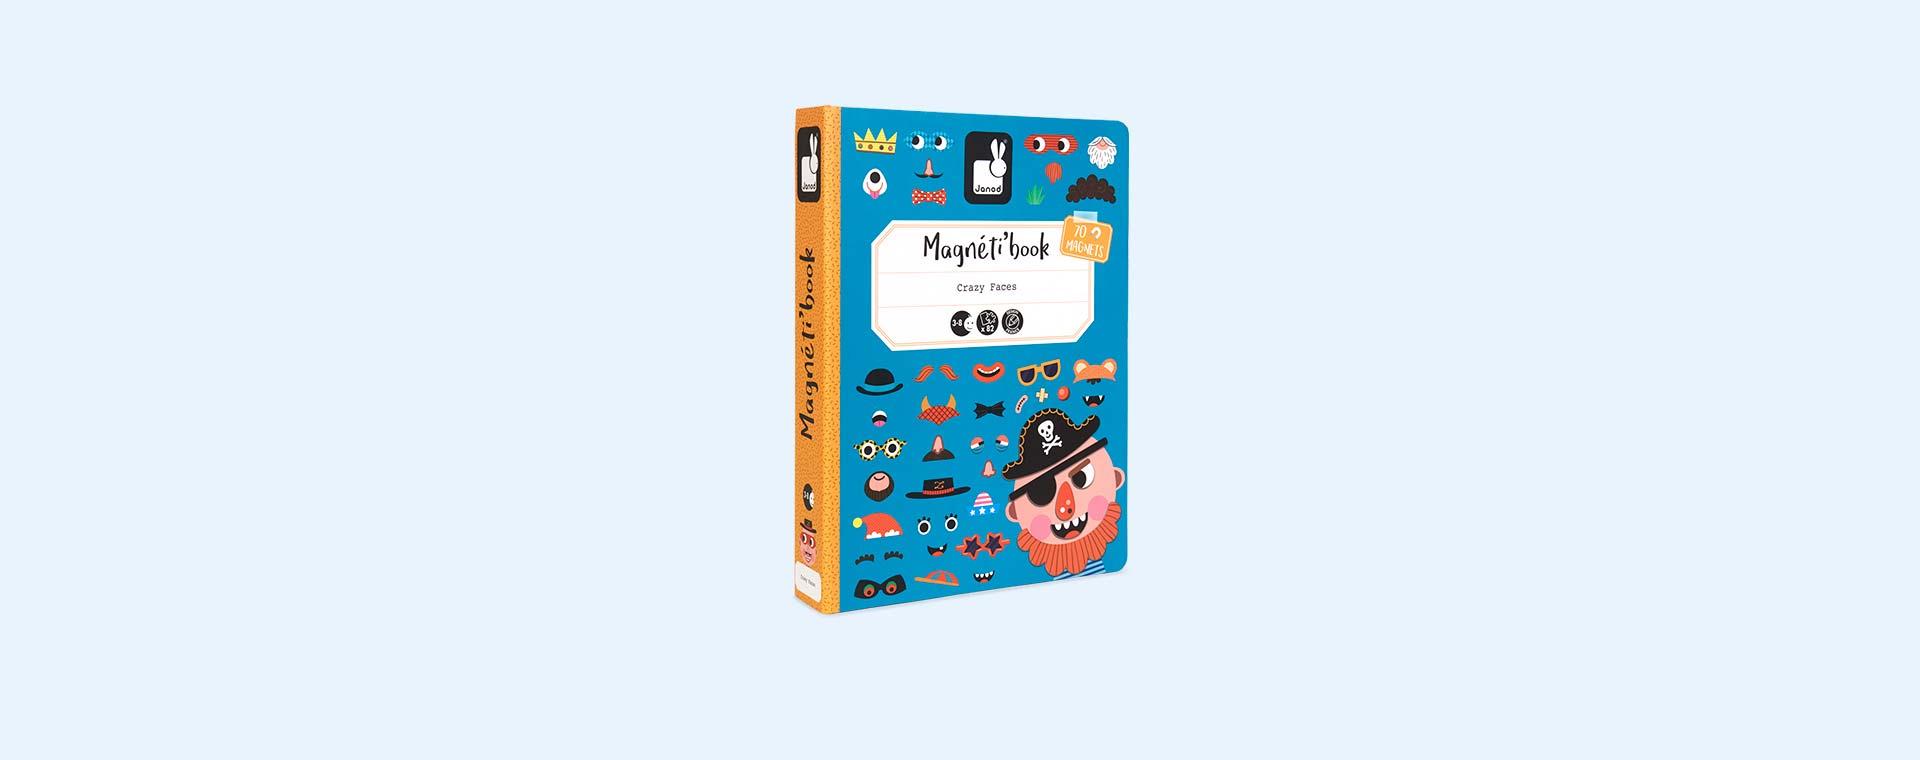 Boys Crazy Faces Janod Magnetibook Educational Toy